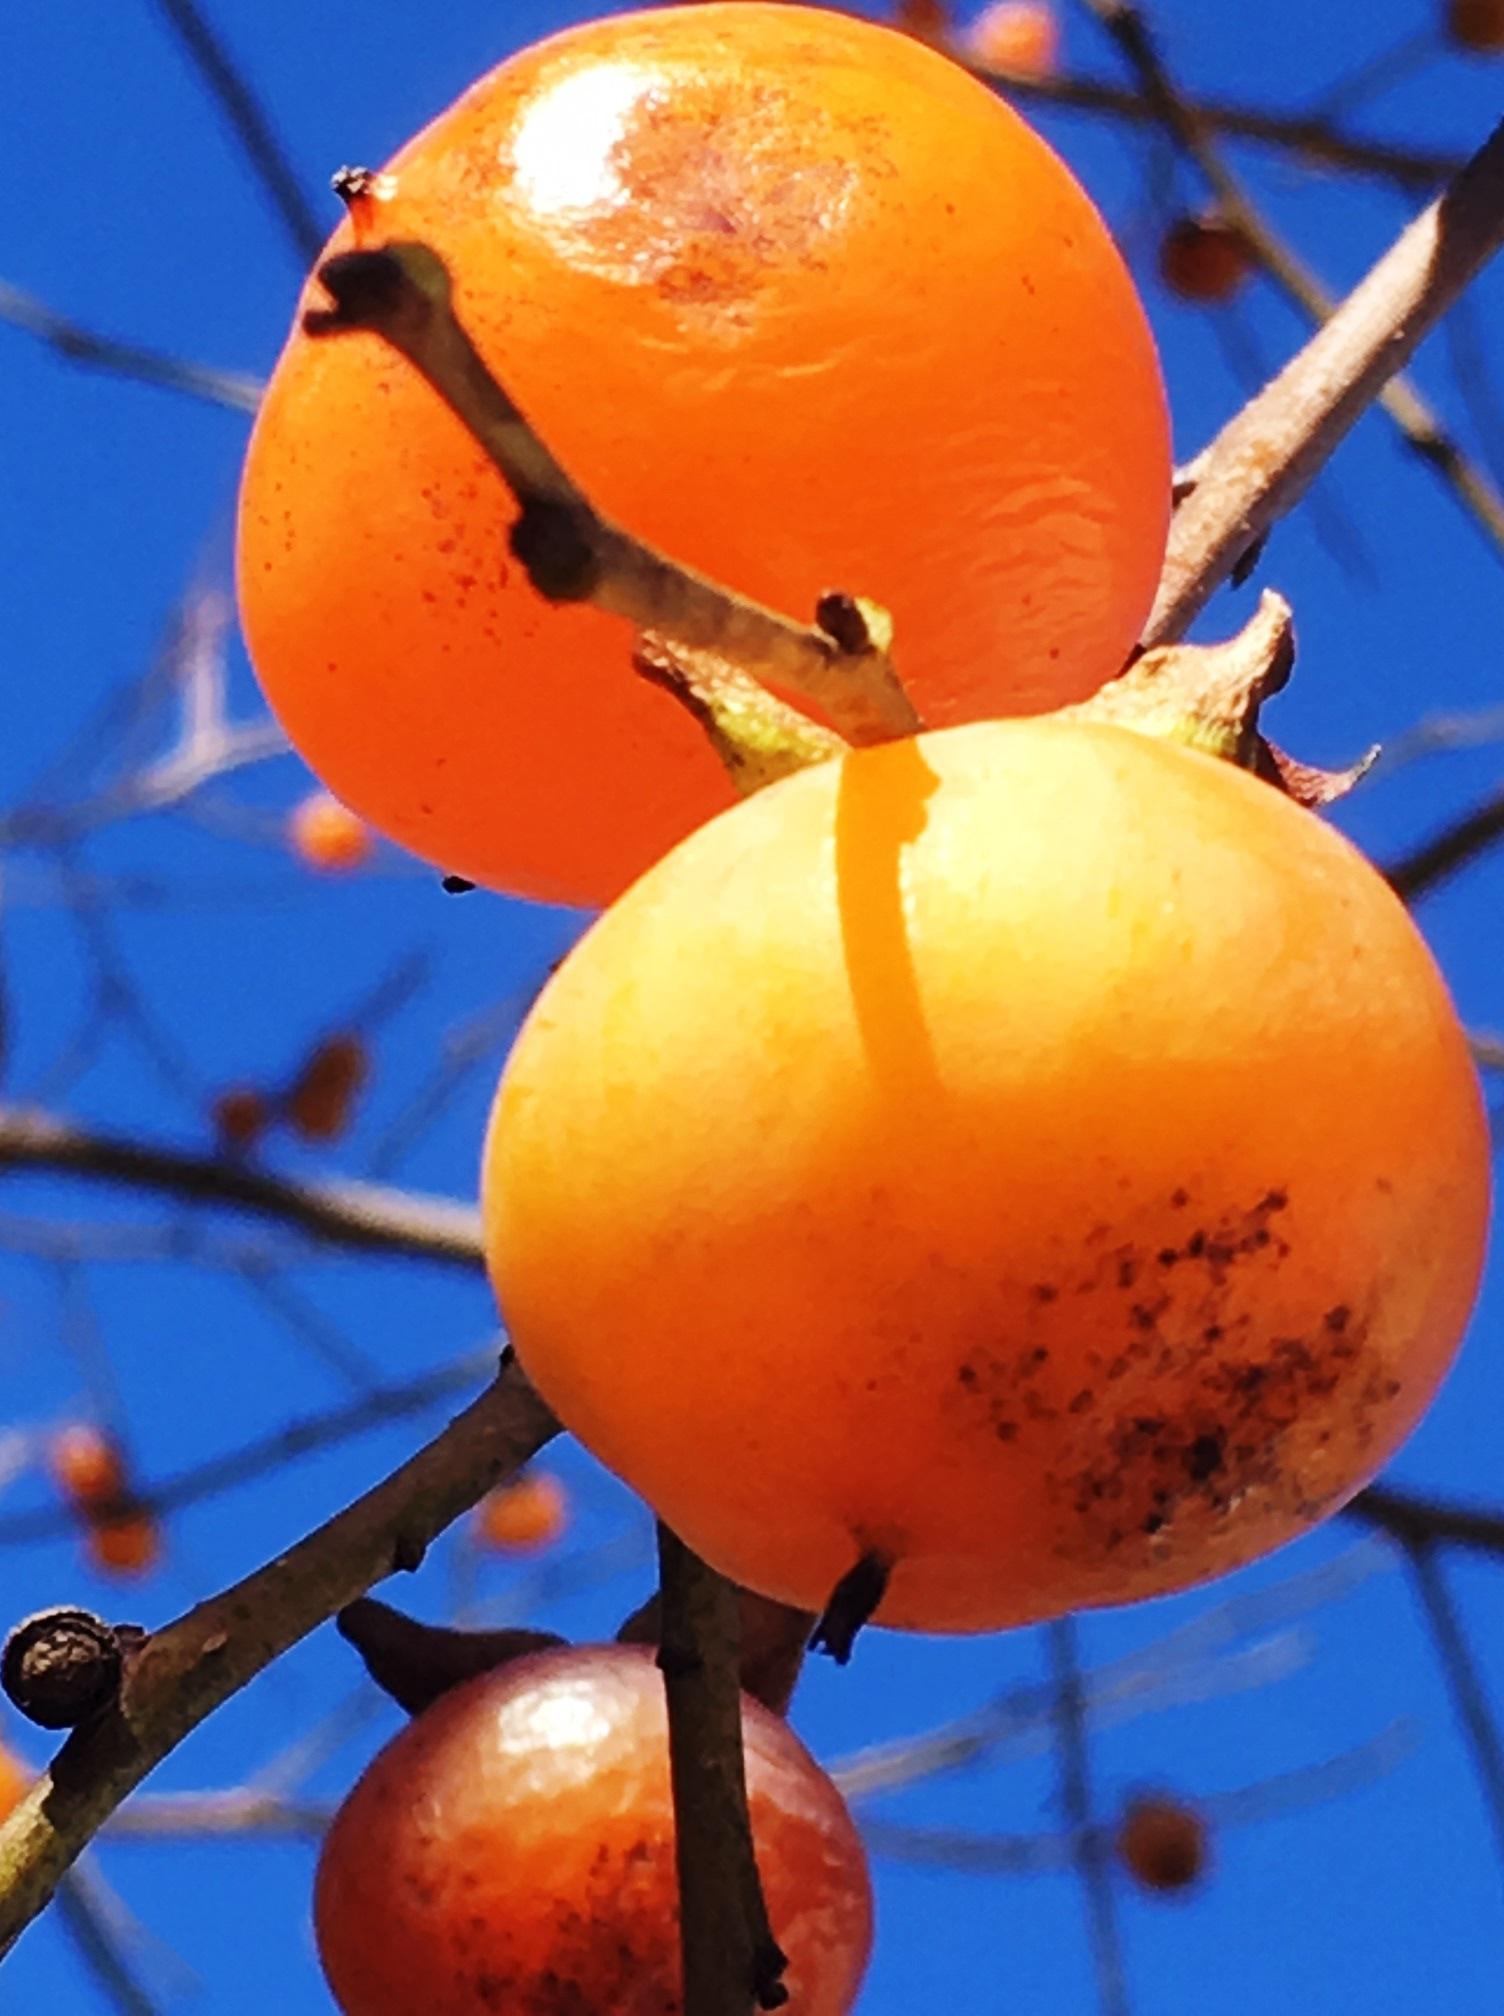 Persimmon fruit close up